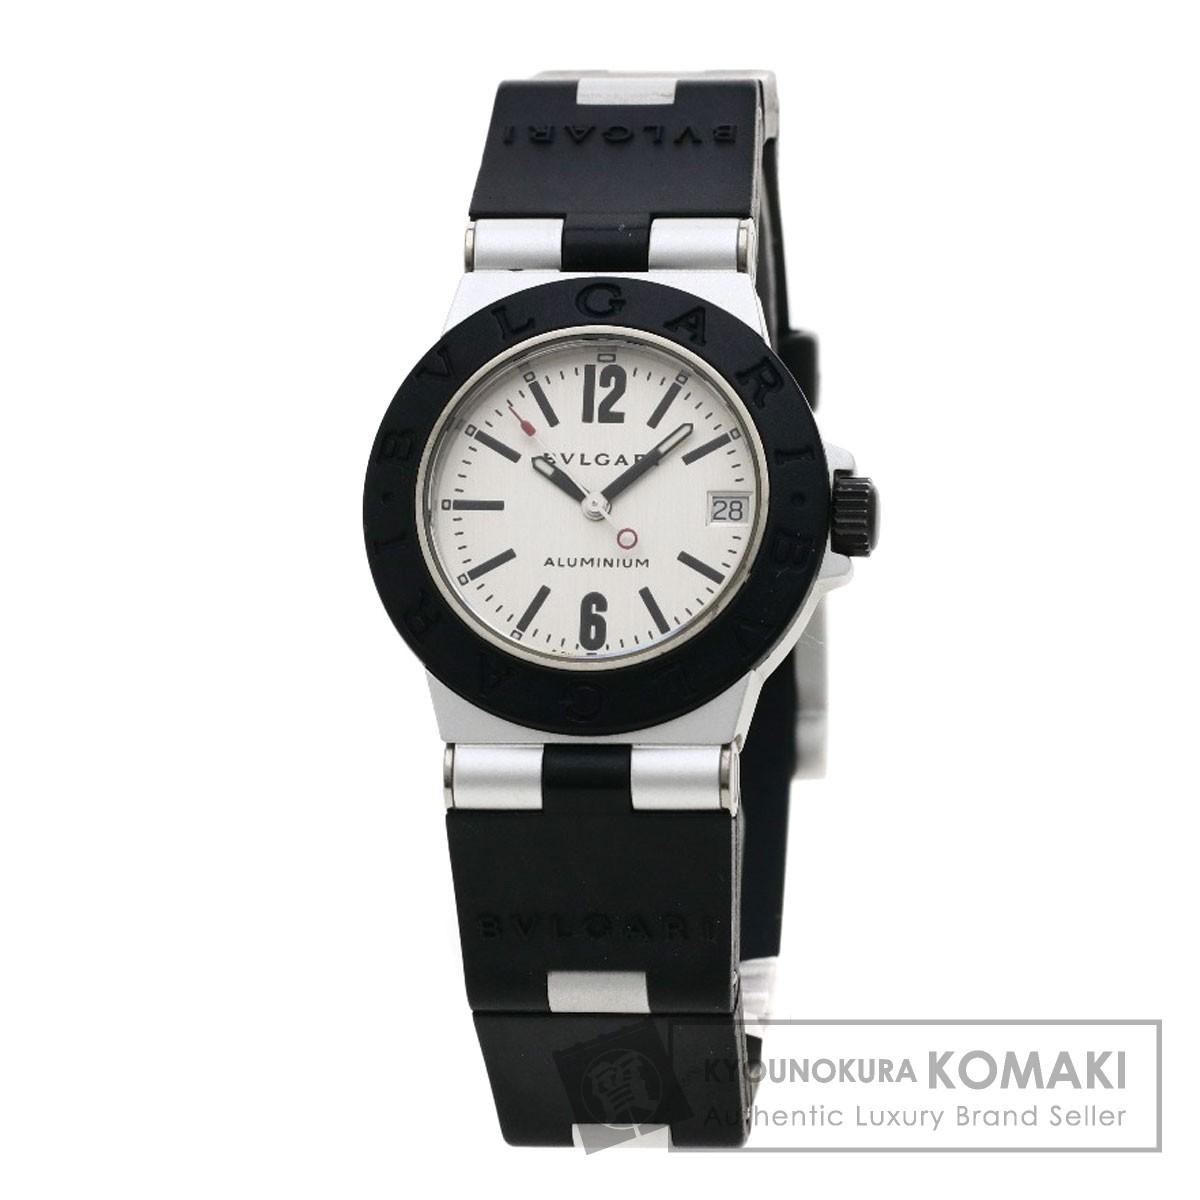 BVLGARI AL32TAVD ディアゴノ アルミニウム 腕時計 アルミニウム/ラバー レディース 【中古】【ブルガリ】